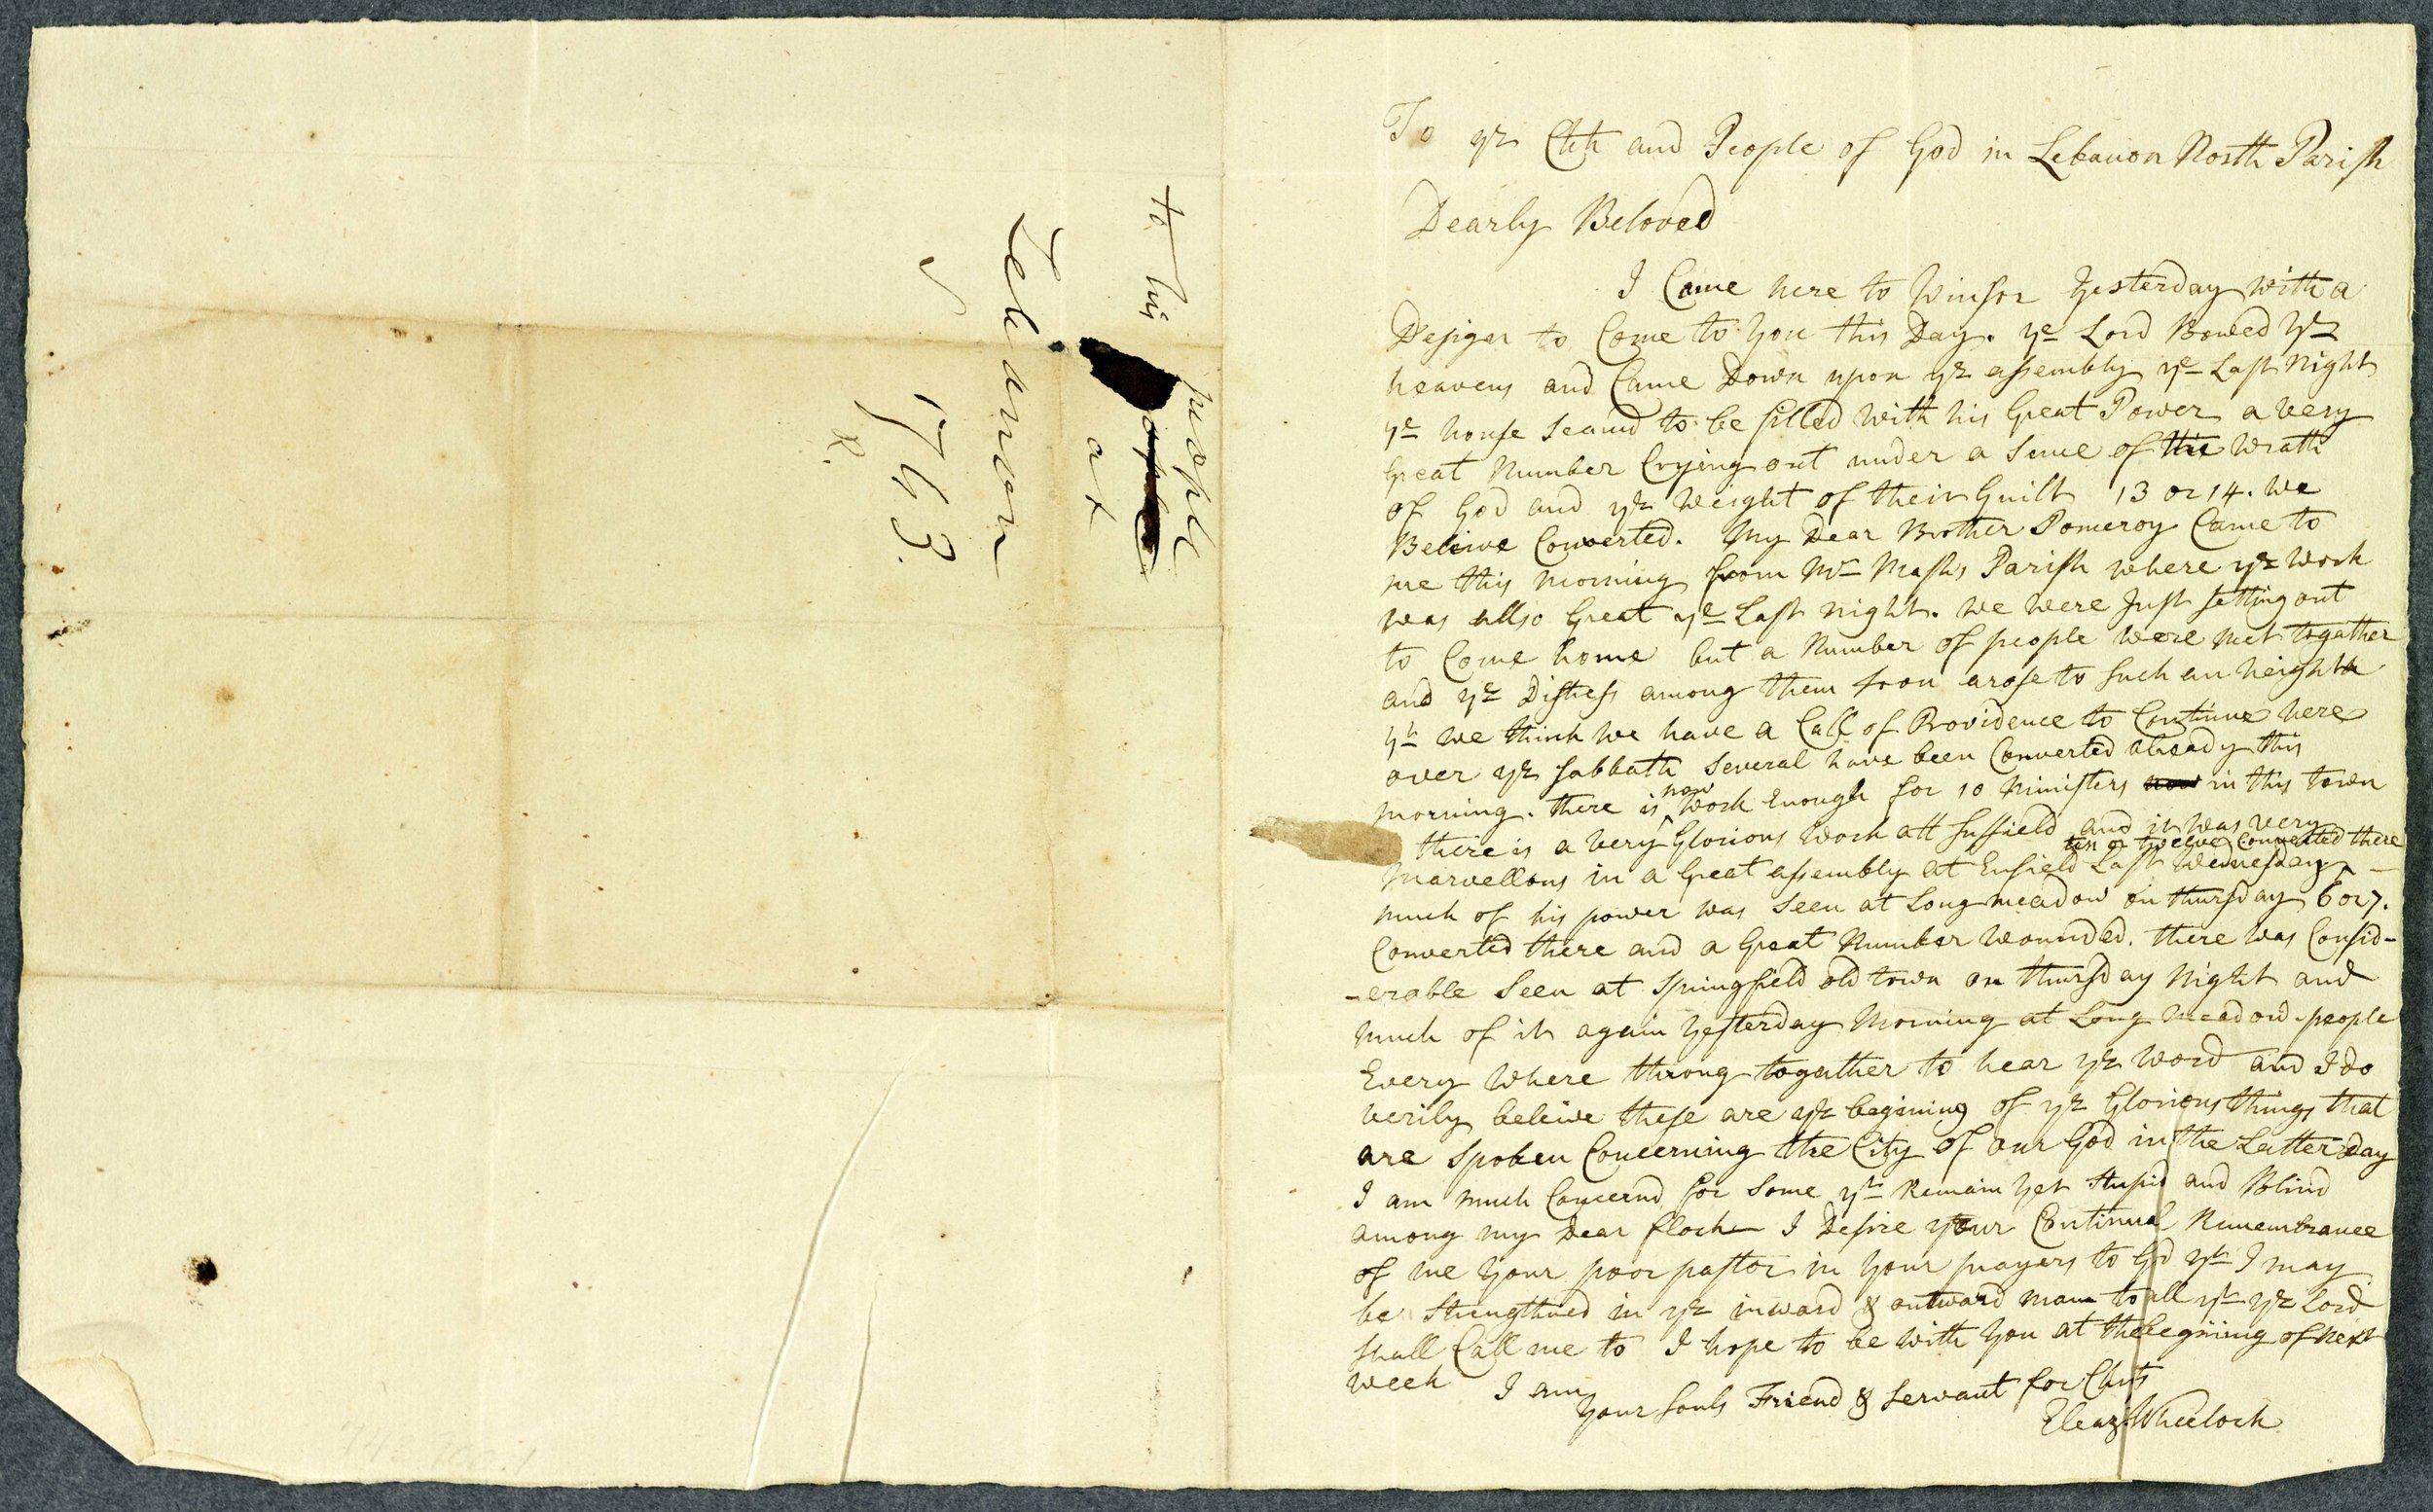 Eleazar Wheelock to the North Parish Church, July 11, 1741. Courtesy of Dartmouth College Library.